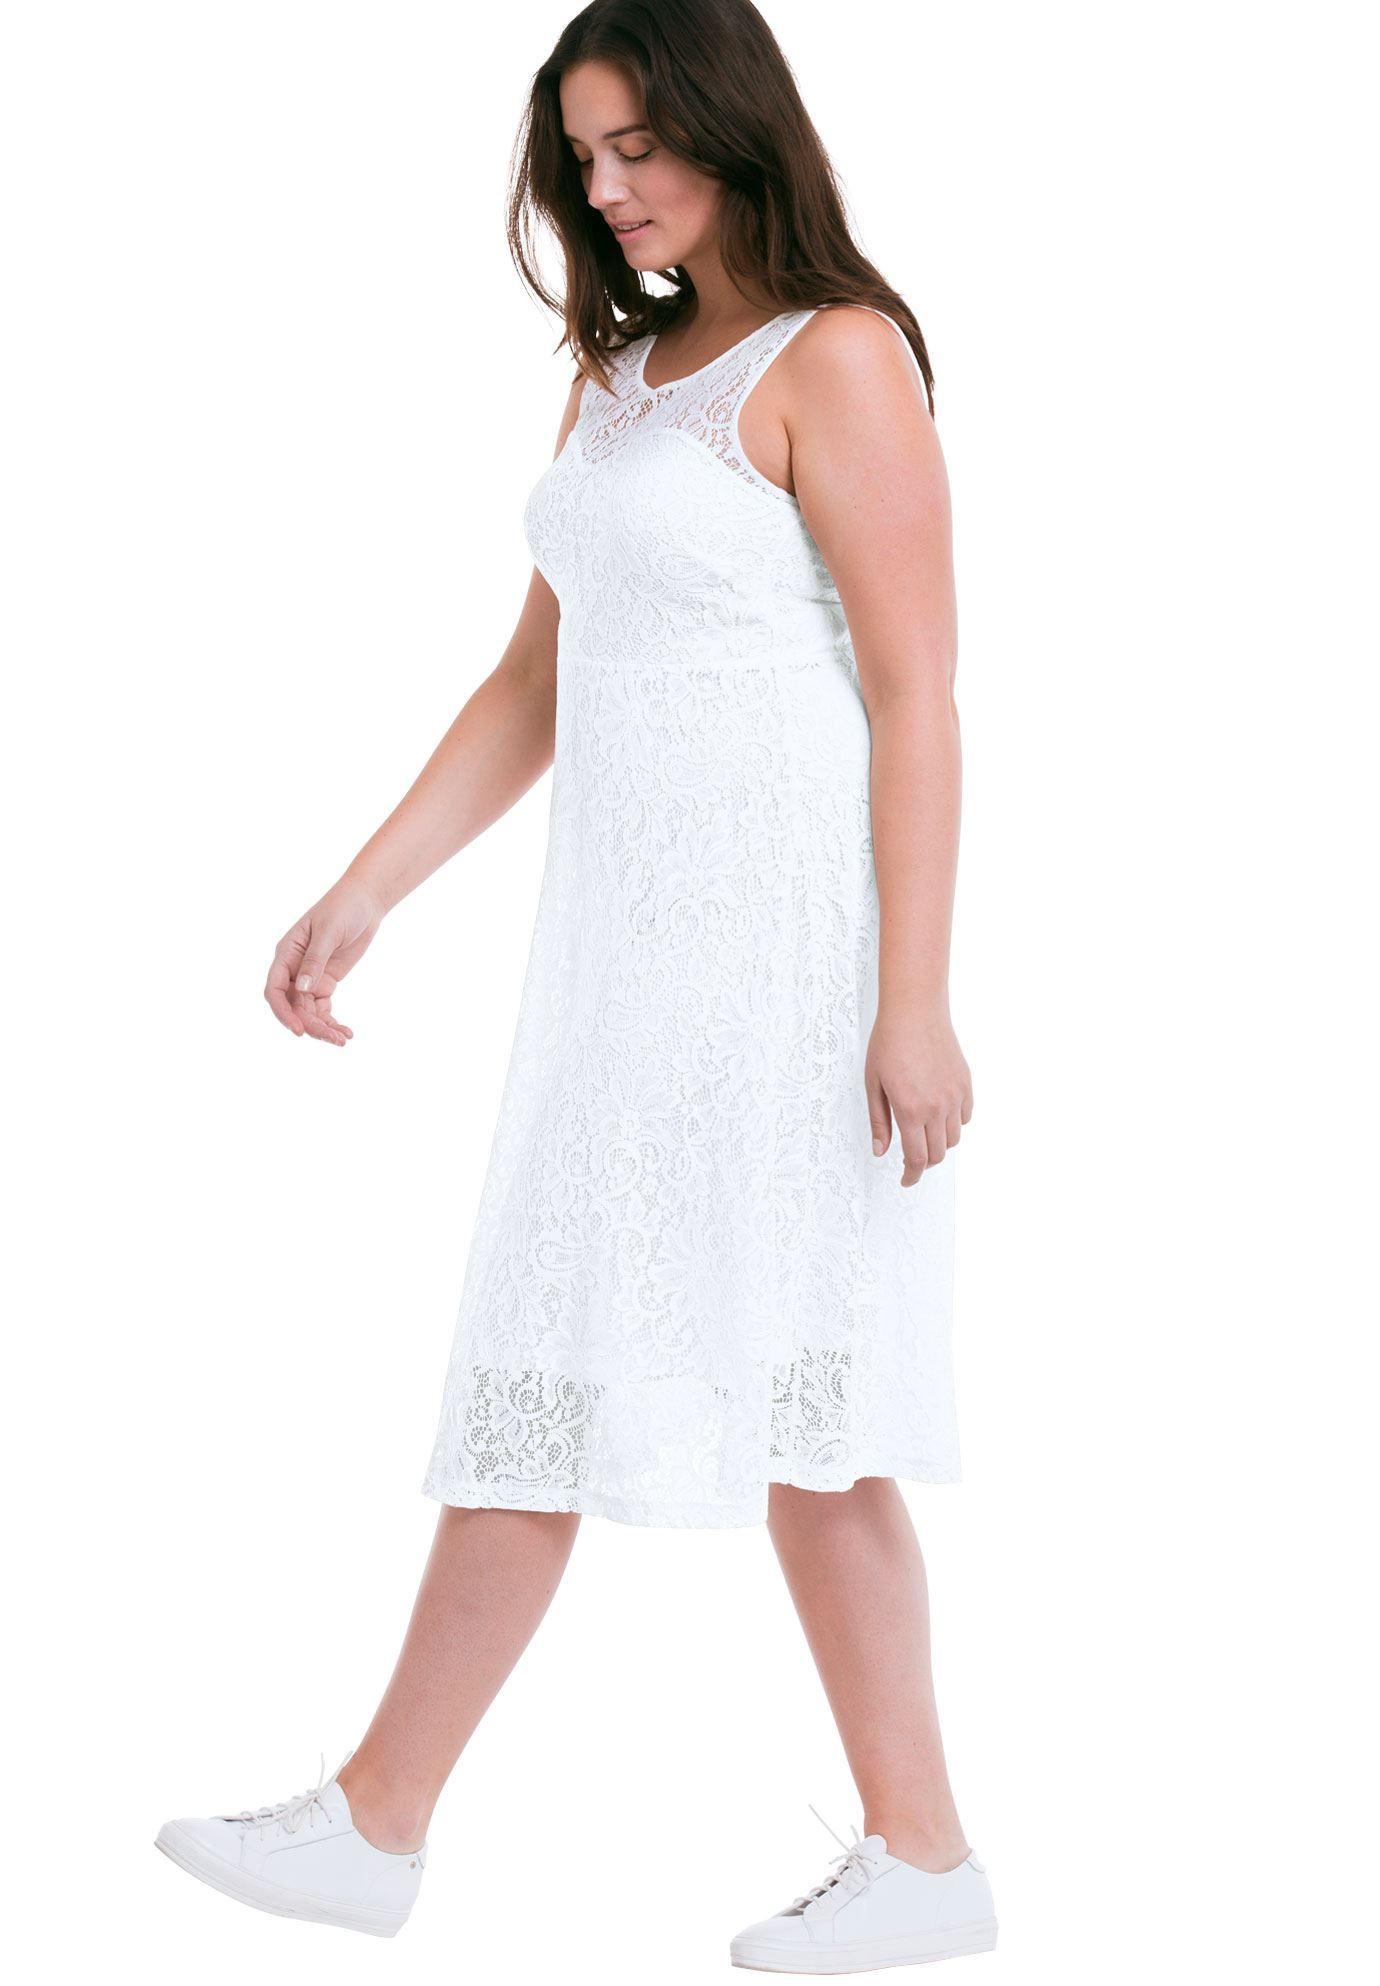 Sleeveless Stretch Lace Dress by Ellos&reg Women s Plus Size